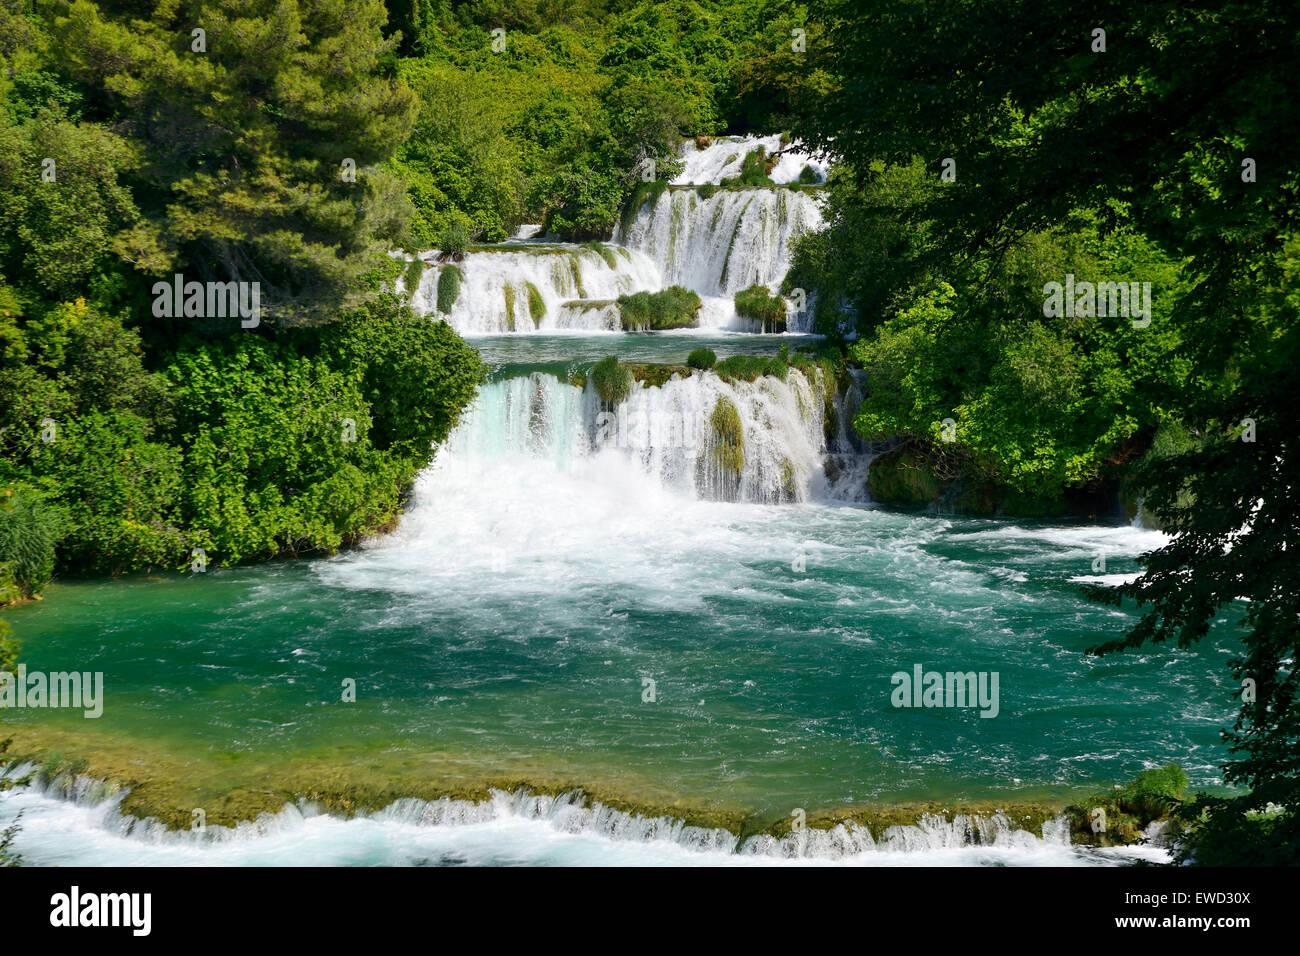 Skradinski Buk waterfalls in Krka National Park on Dalmatian Coast of Croatia - Stock Image